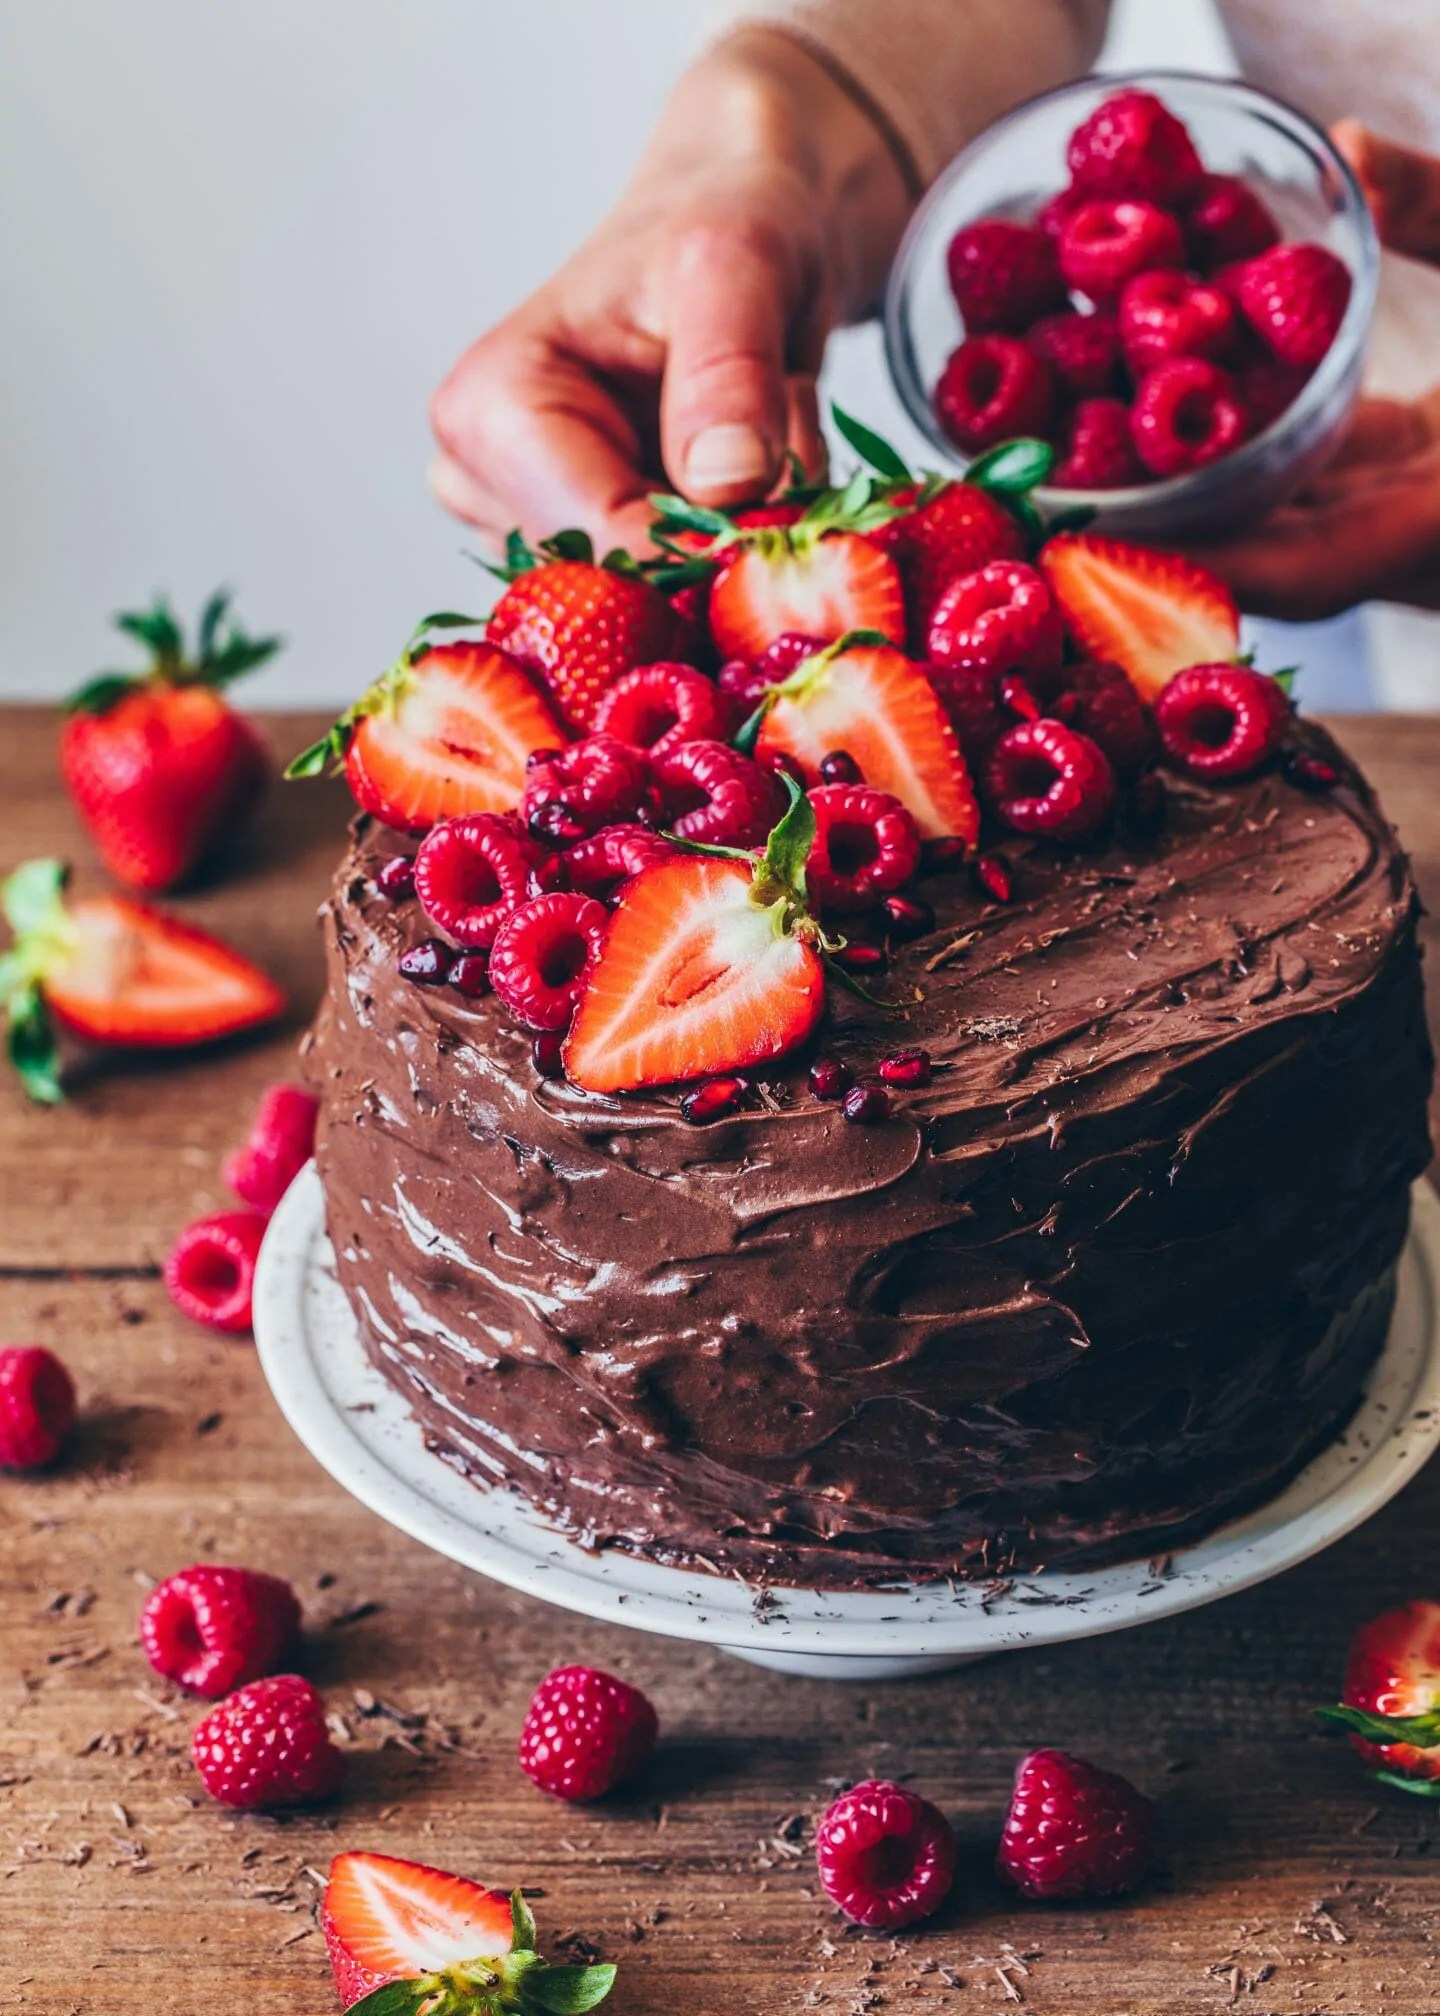 Chocolate Raspberry Cake Vegan Bianca Zapatka Foodblog